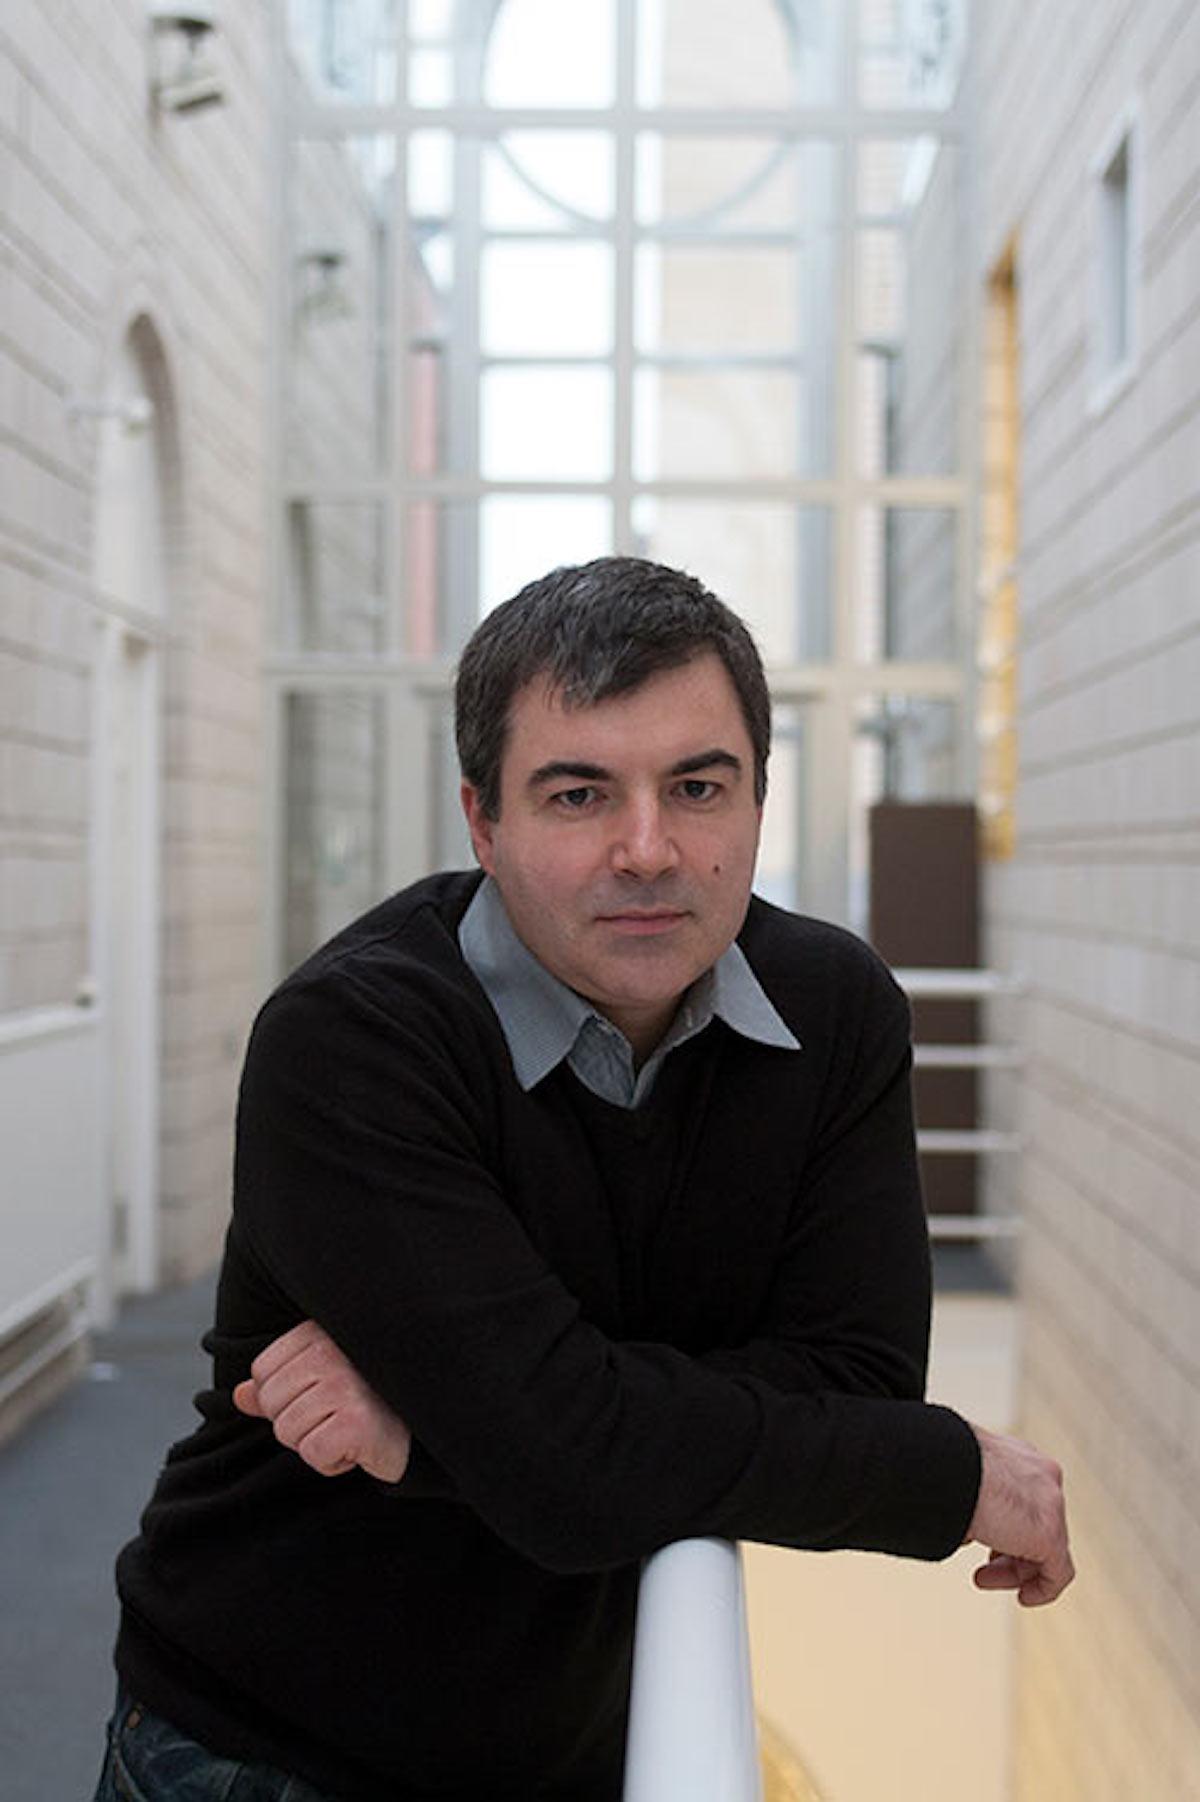 Giáo sư Vật lý Kostya Novoselov